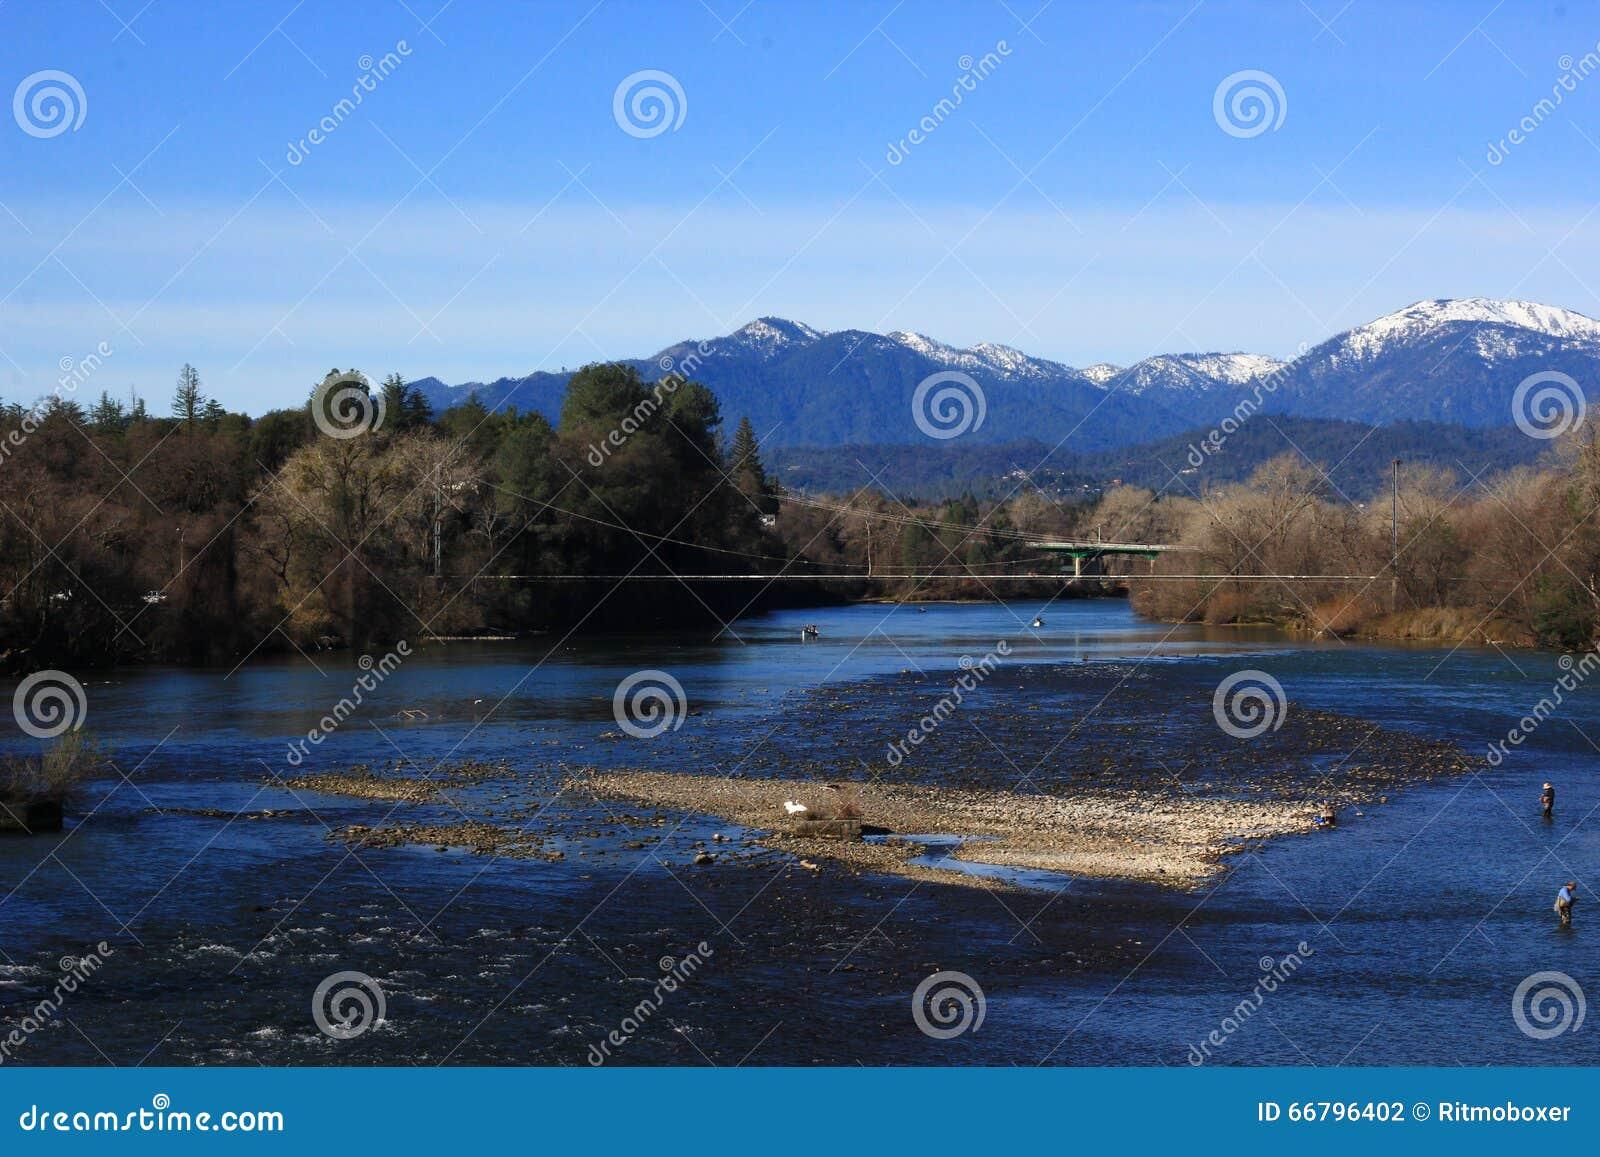 Sacramento River View In Redding California Stock Photo Image Of